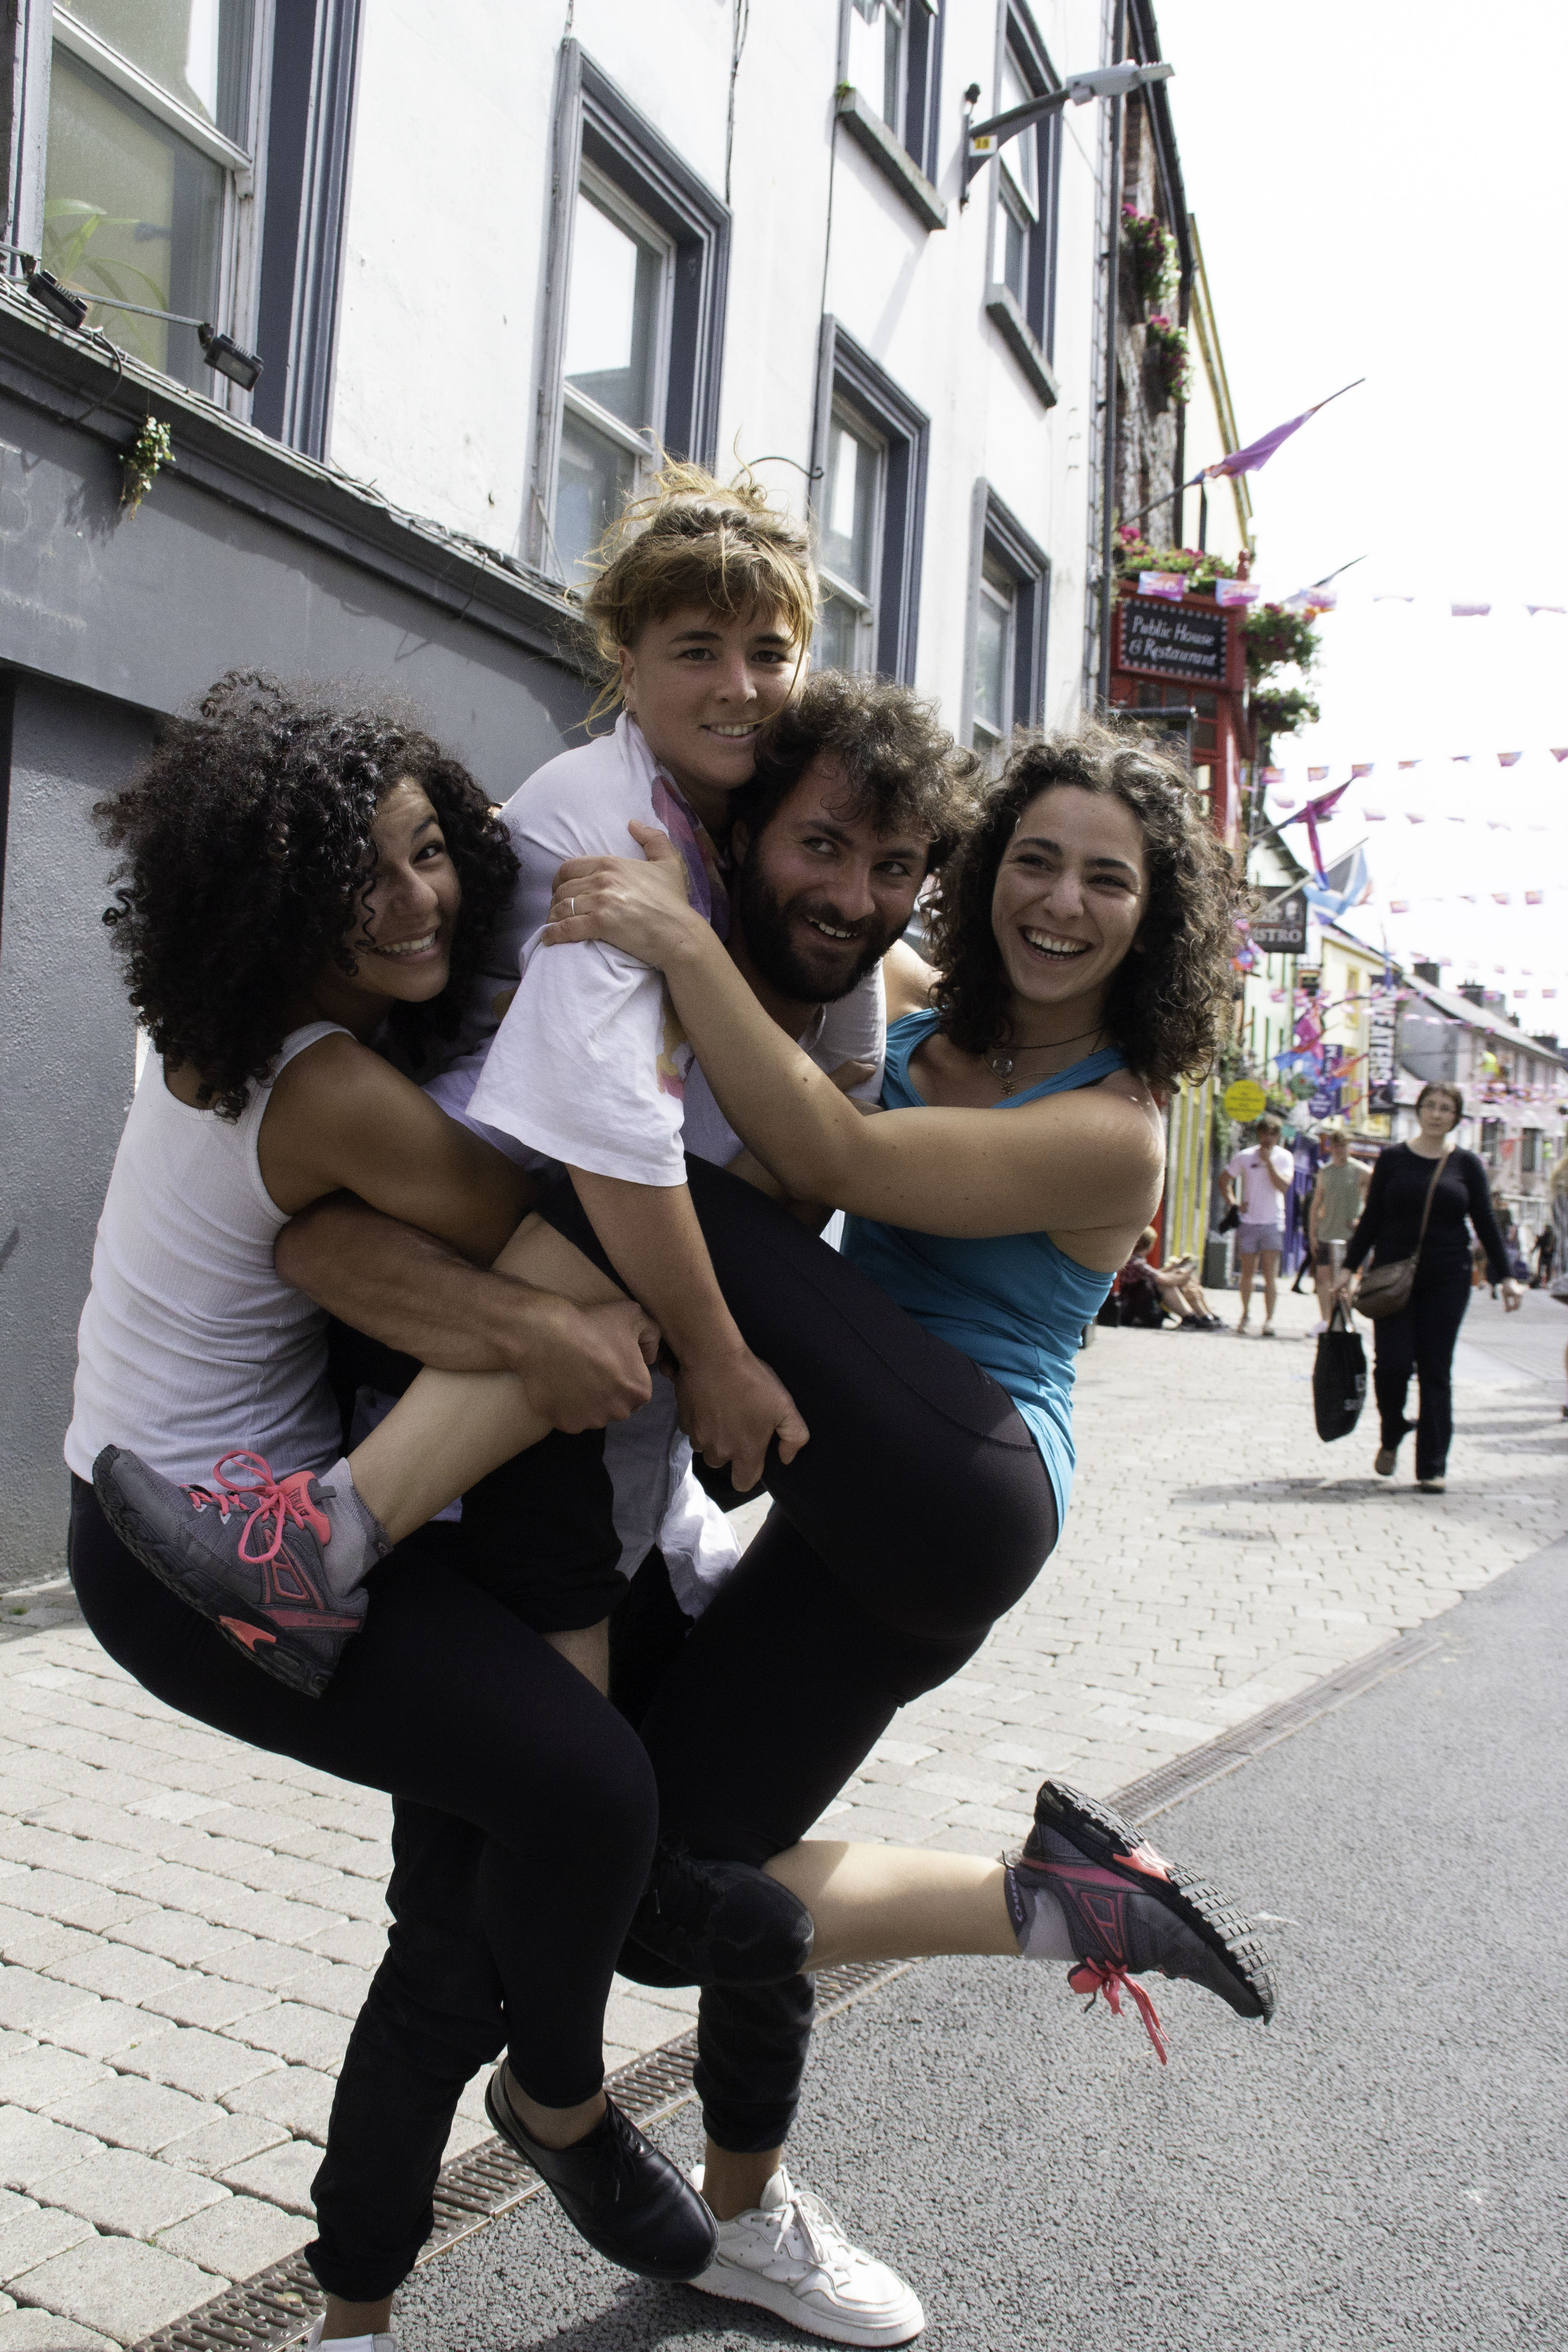 ESC June 2020 Galway Community Circus